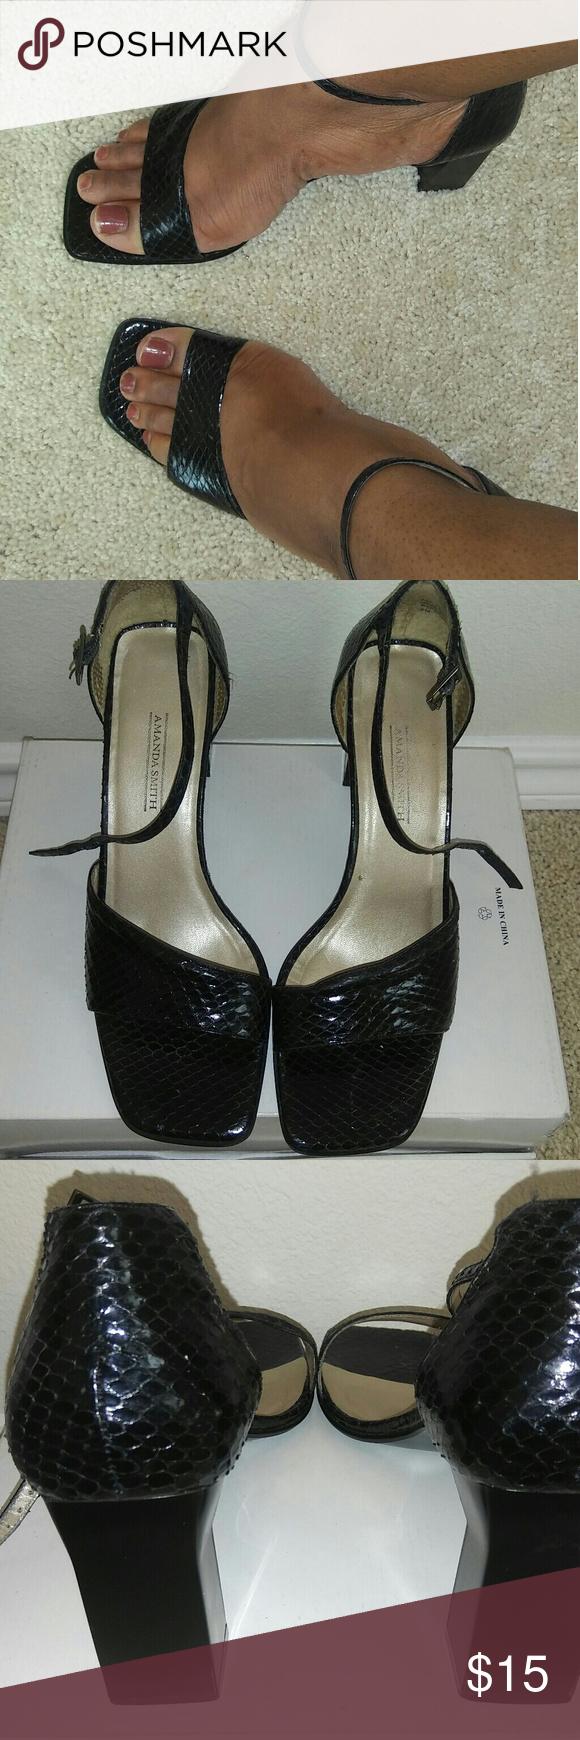 WOMEN SNAKE DESIGN HEELS Black  Snake Skin Pattern Chunky Heel  No Scuffs  No Marks   *Make An Offer* Amanda Smith Shoes Heels